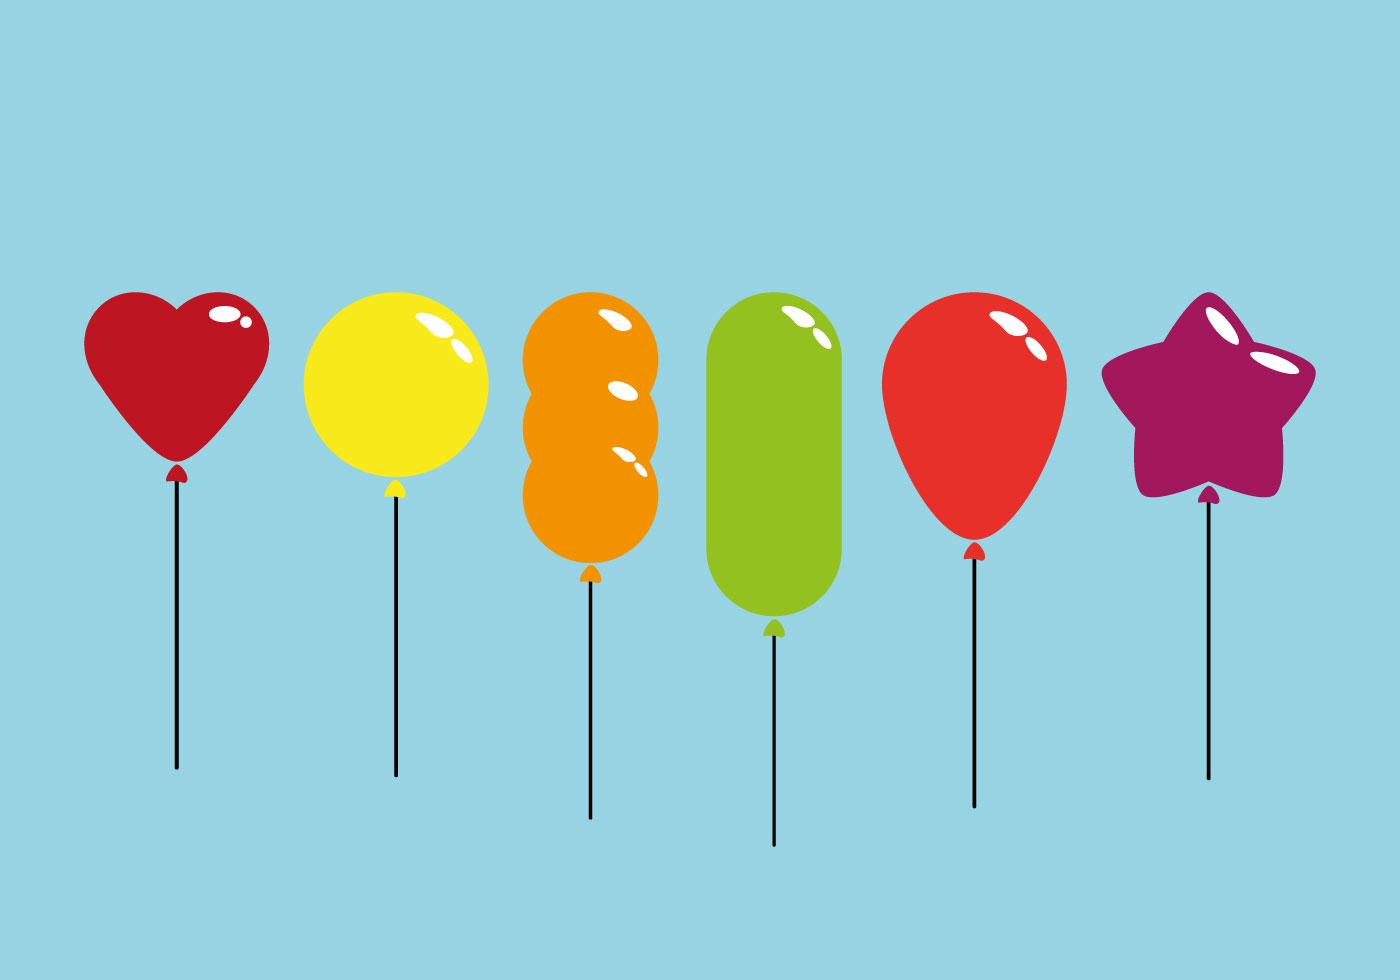 balloon free vector art 19137 free downloads rh vecteezy com balloon vector freepik balloon vector free download